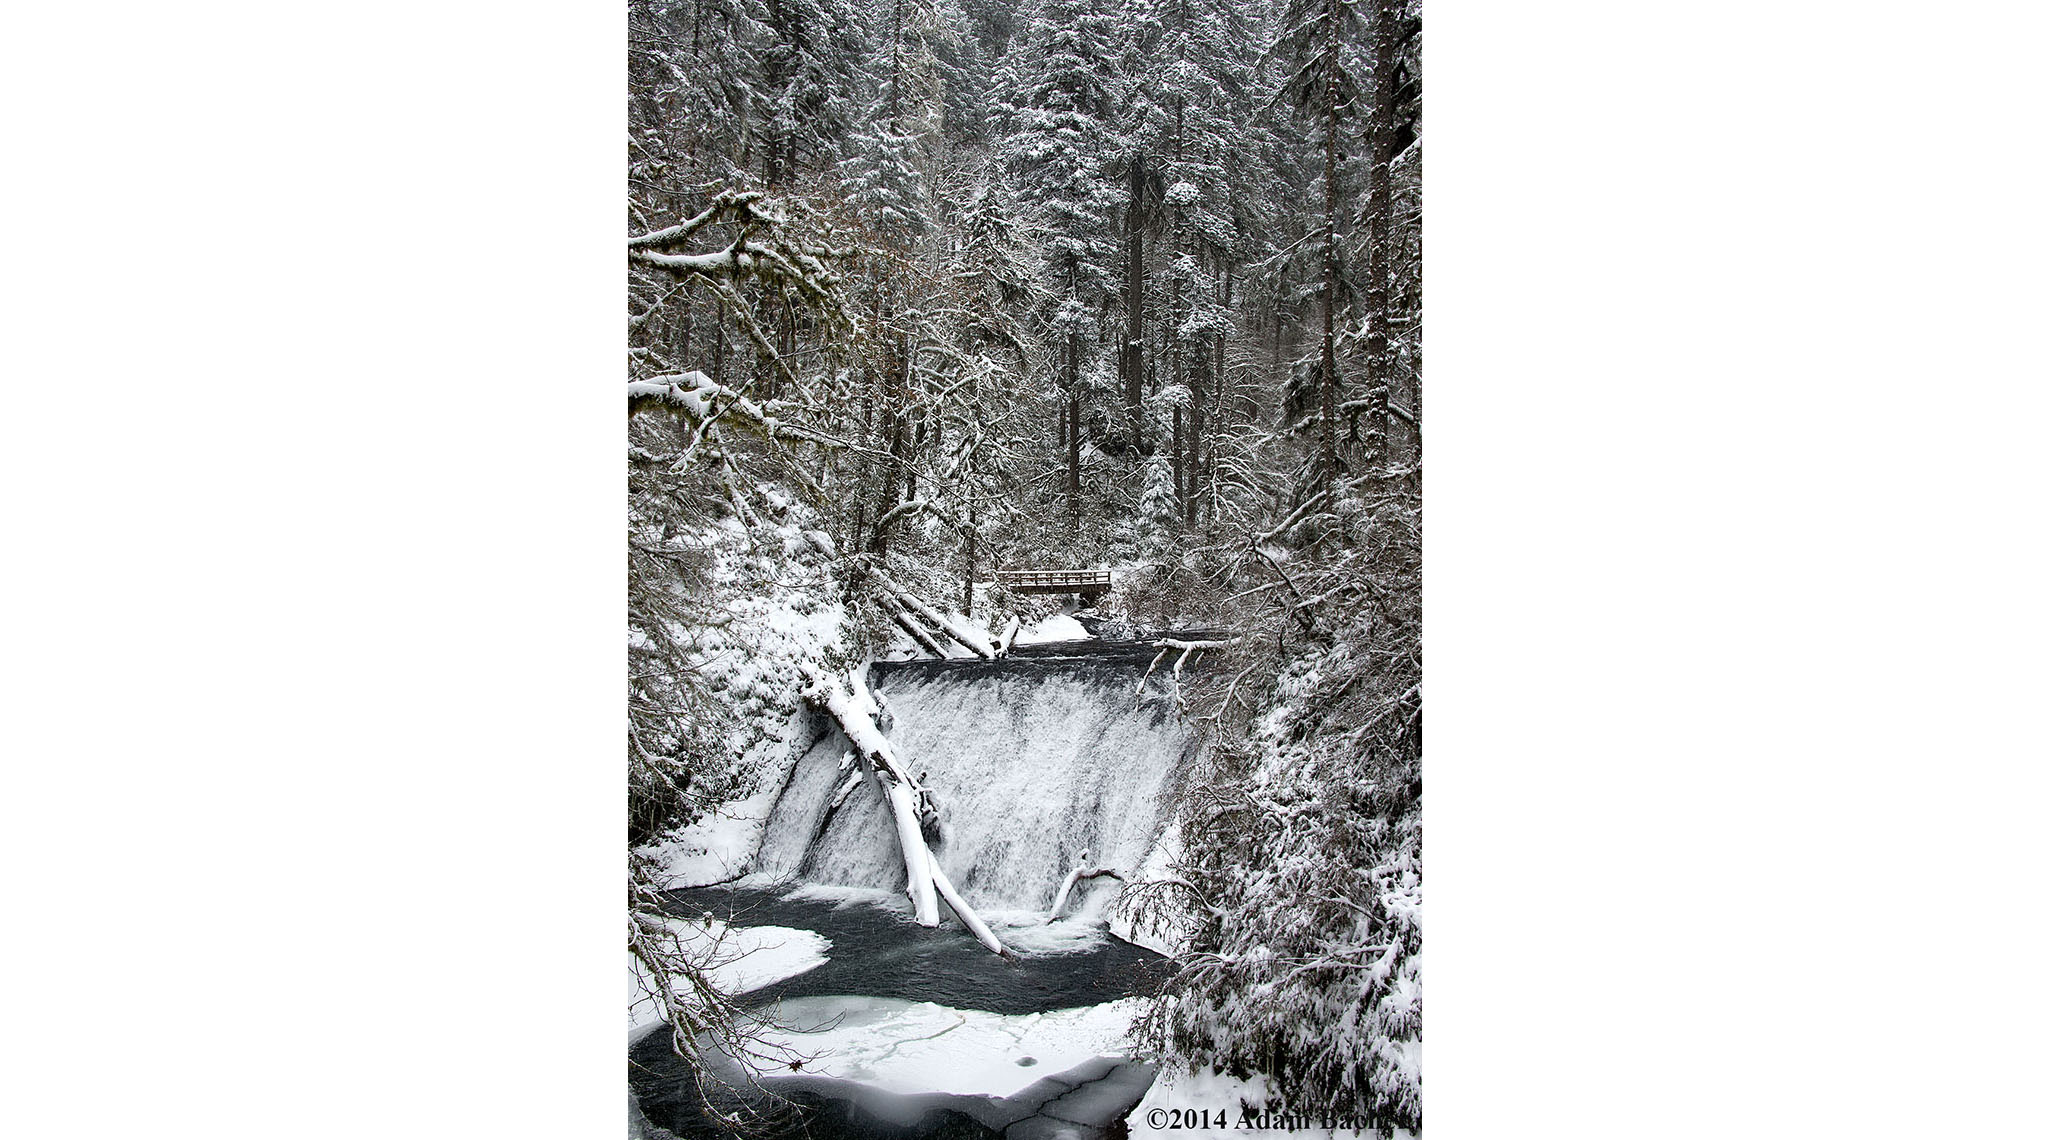 silver falls state park oregon